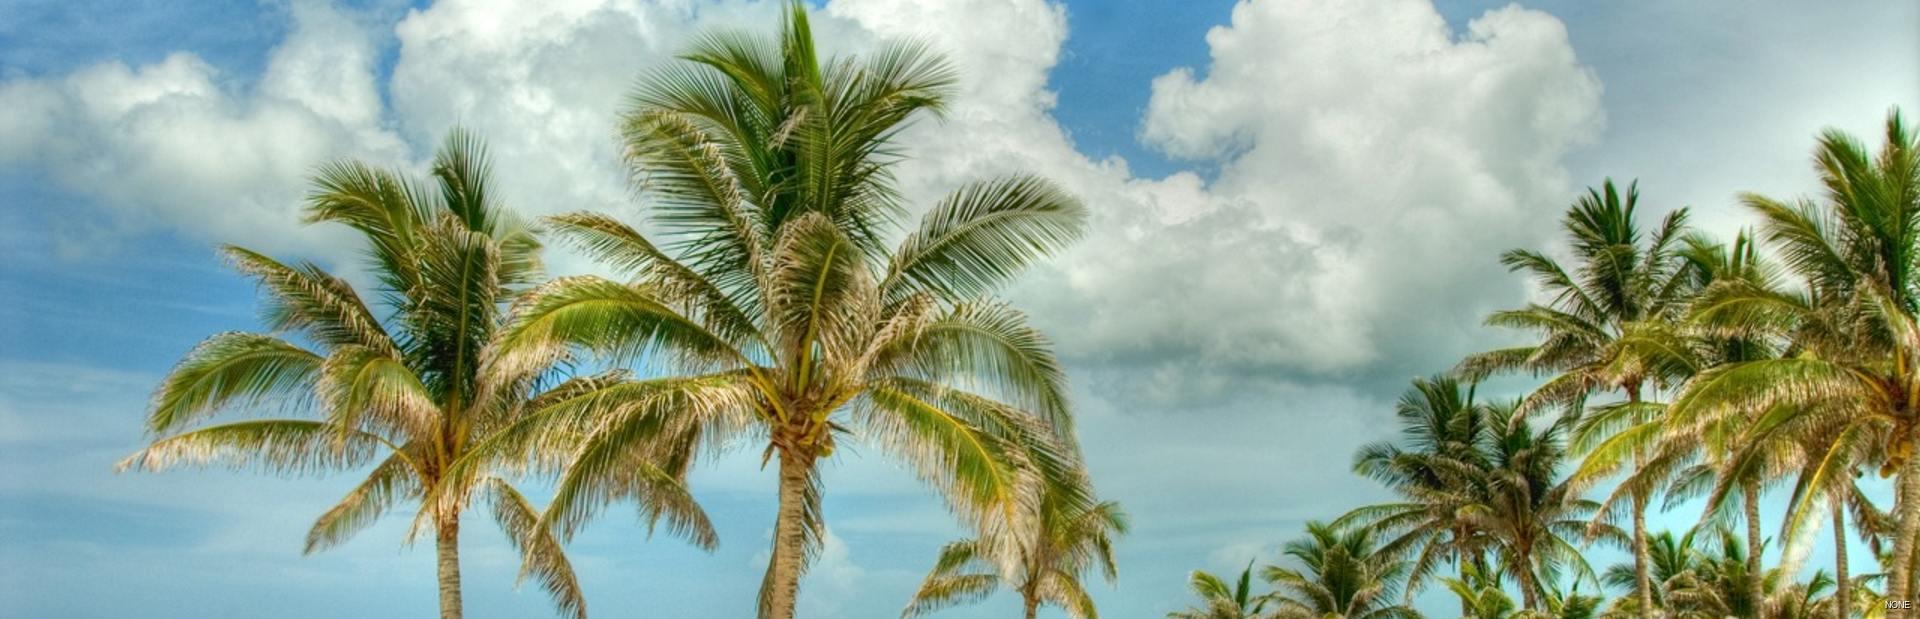 Nassau climate photo